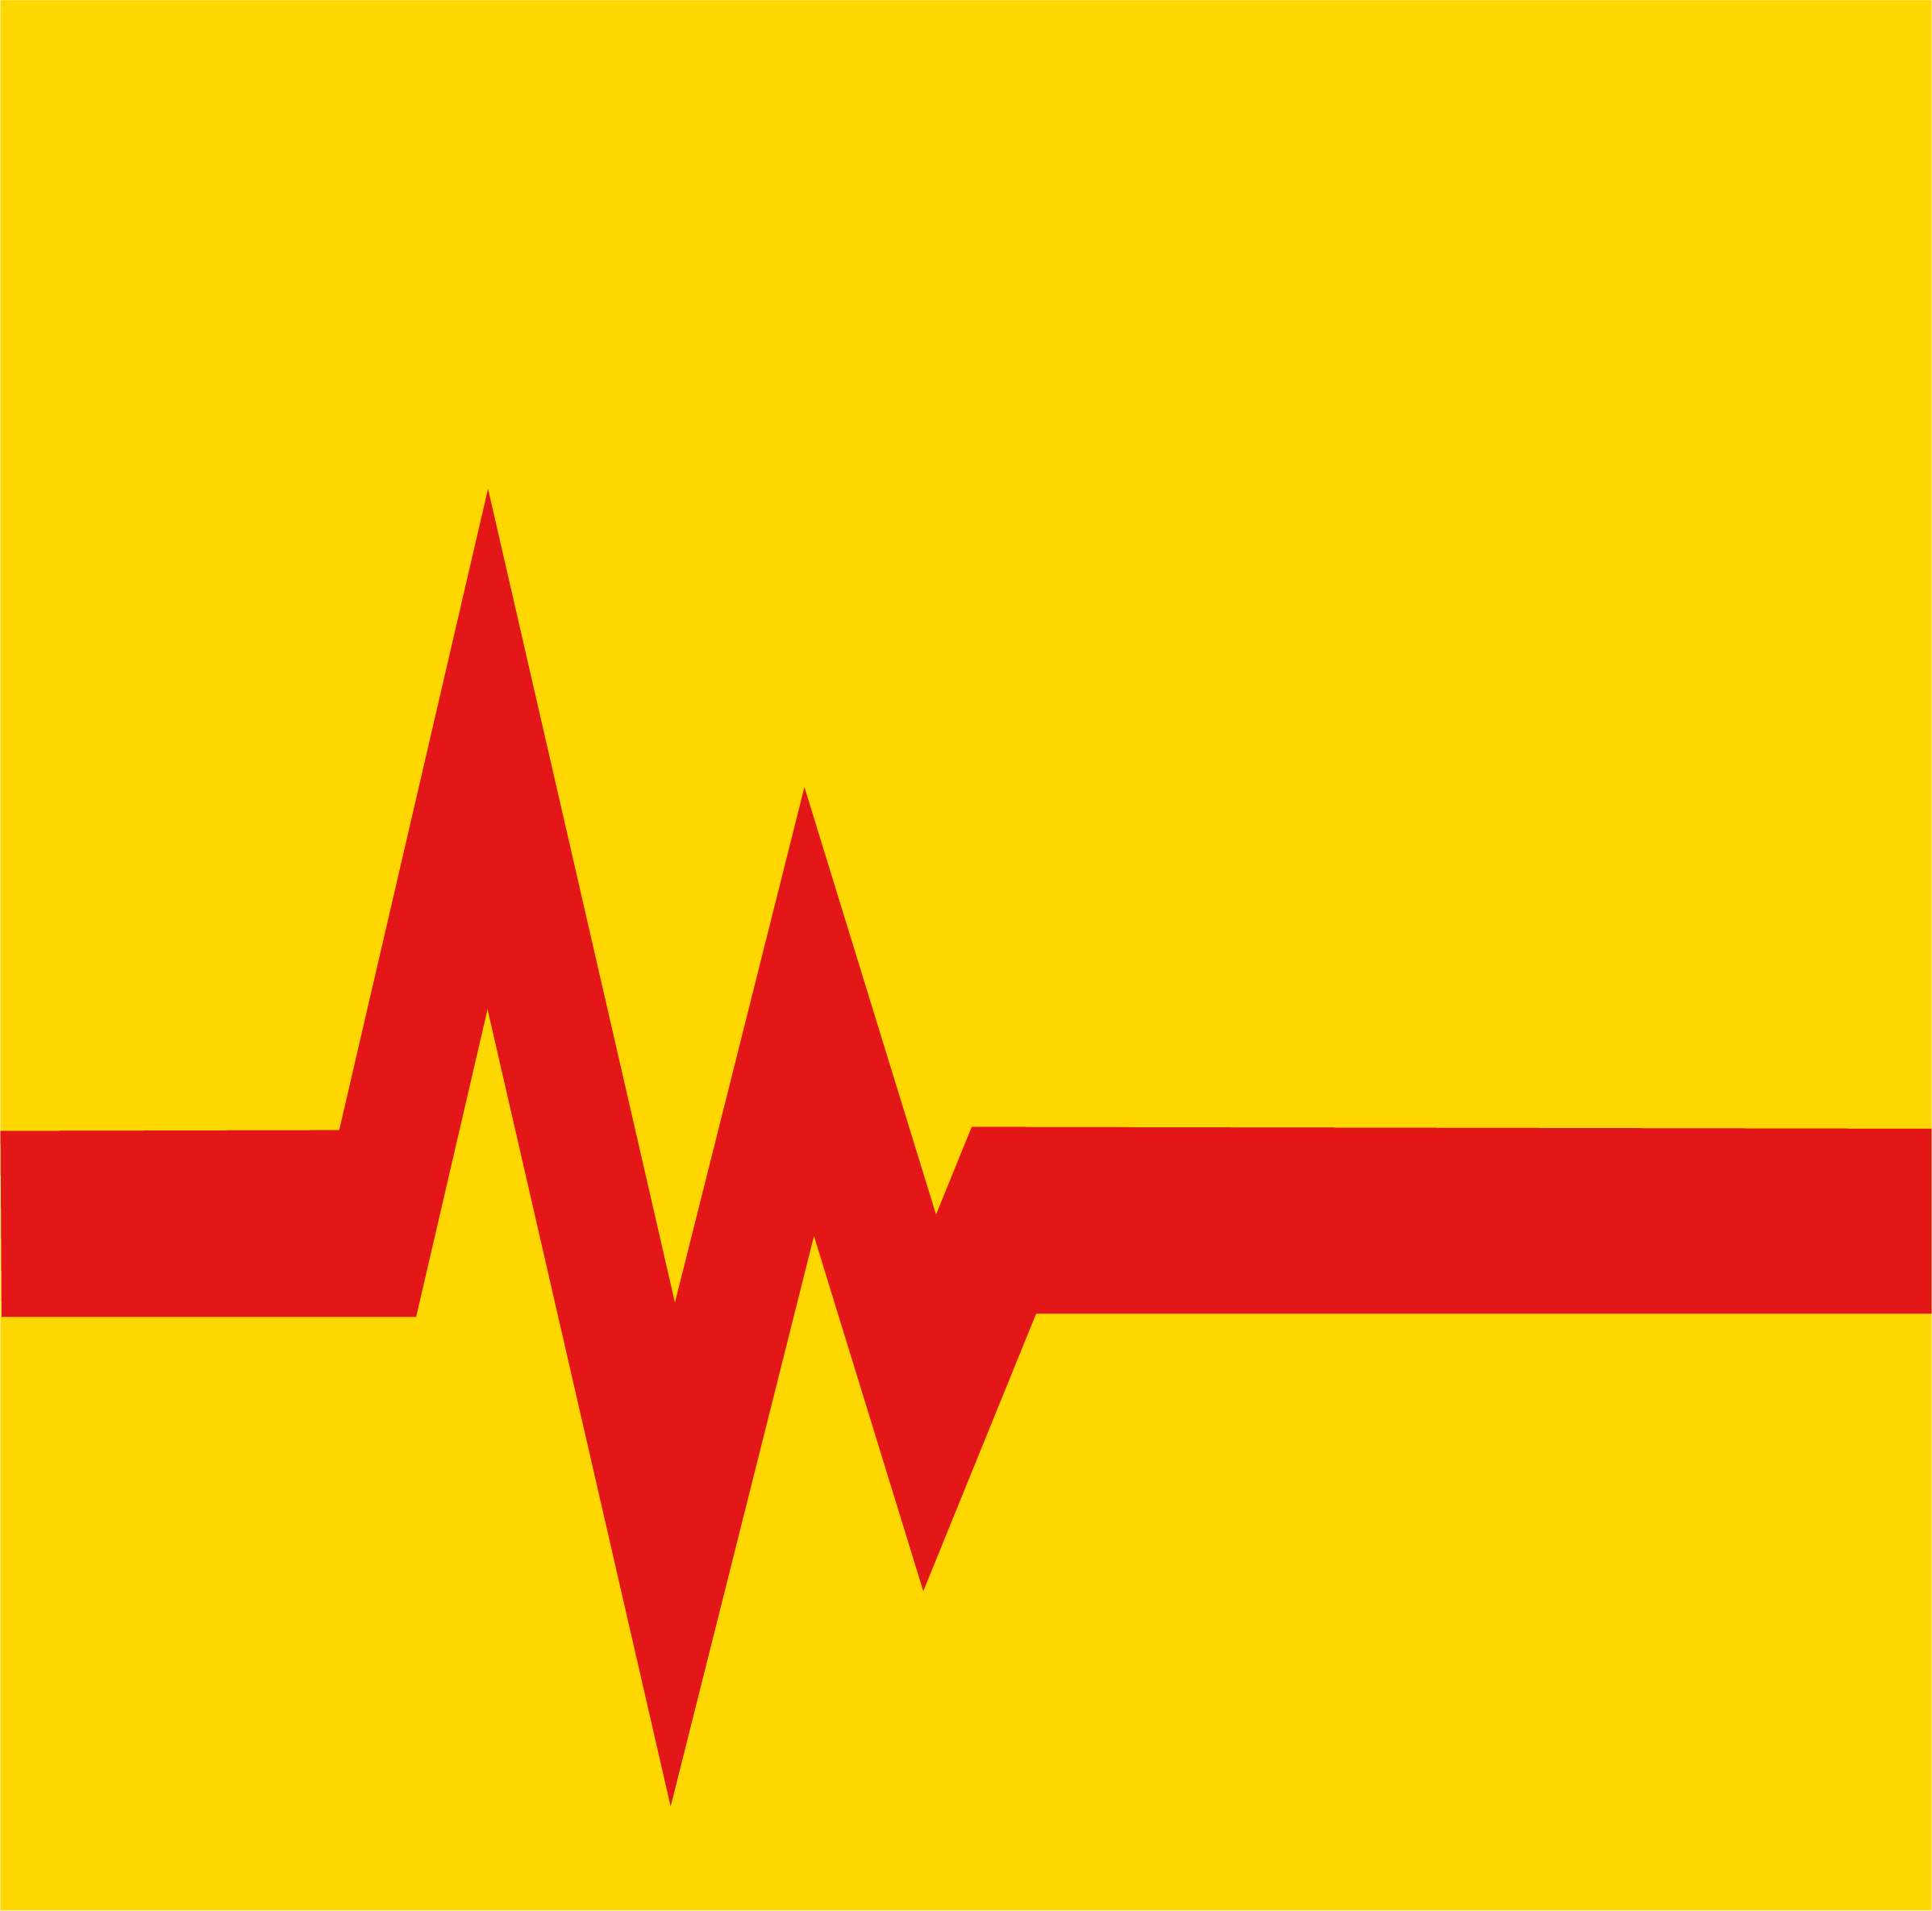 <p>มาร์เชลโล ลอล็อต อาร์ยาฟารา<br /> ทูตประชาสัมพันธ์โครงการปฐมพยาบาล</p>